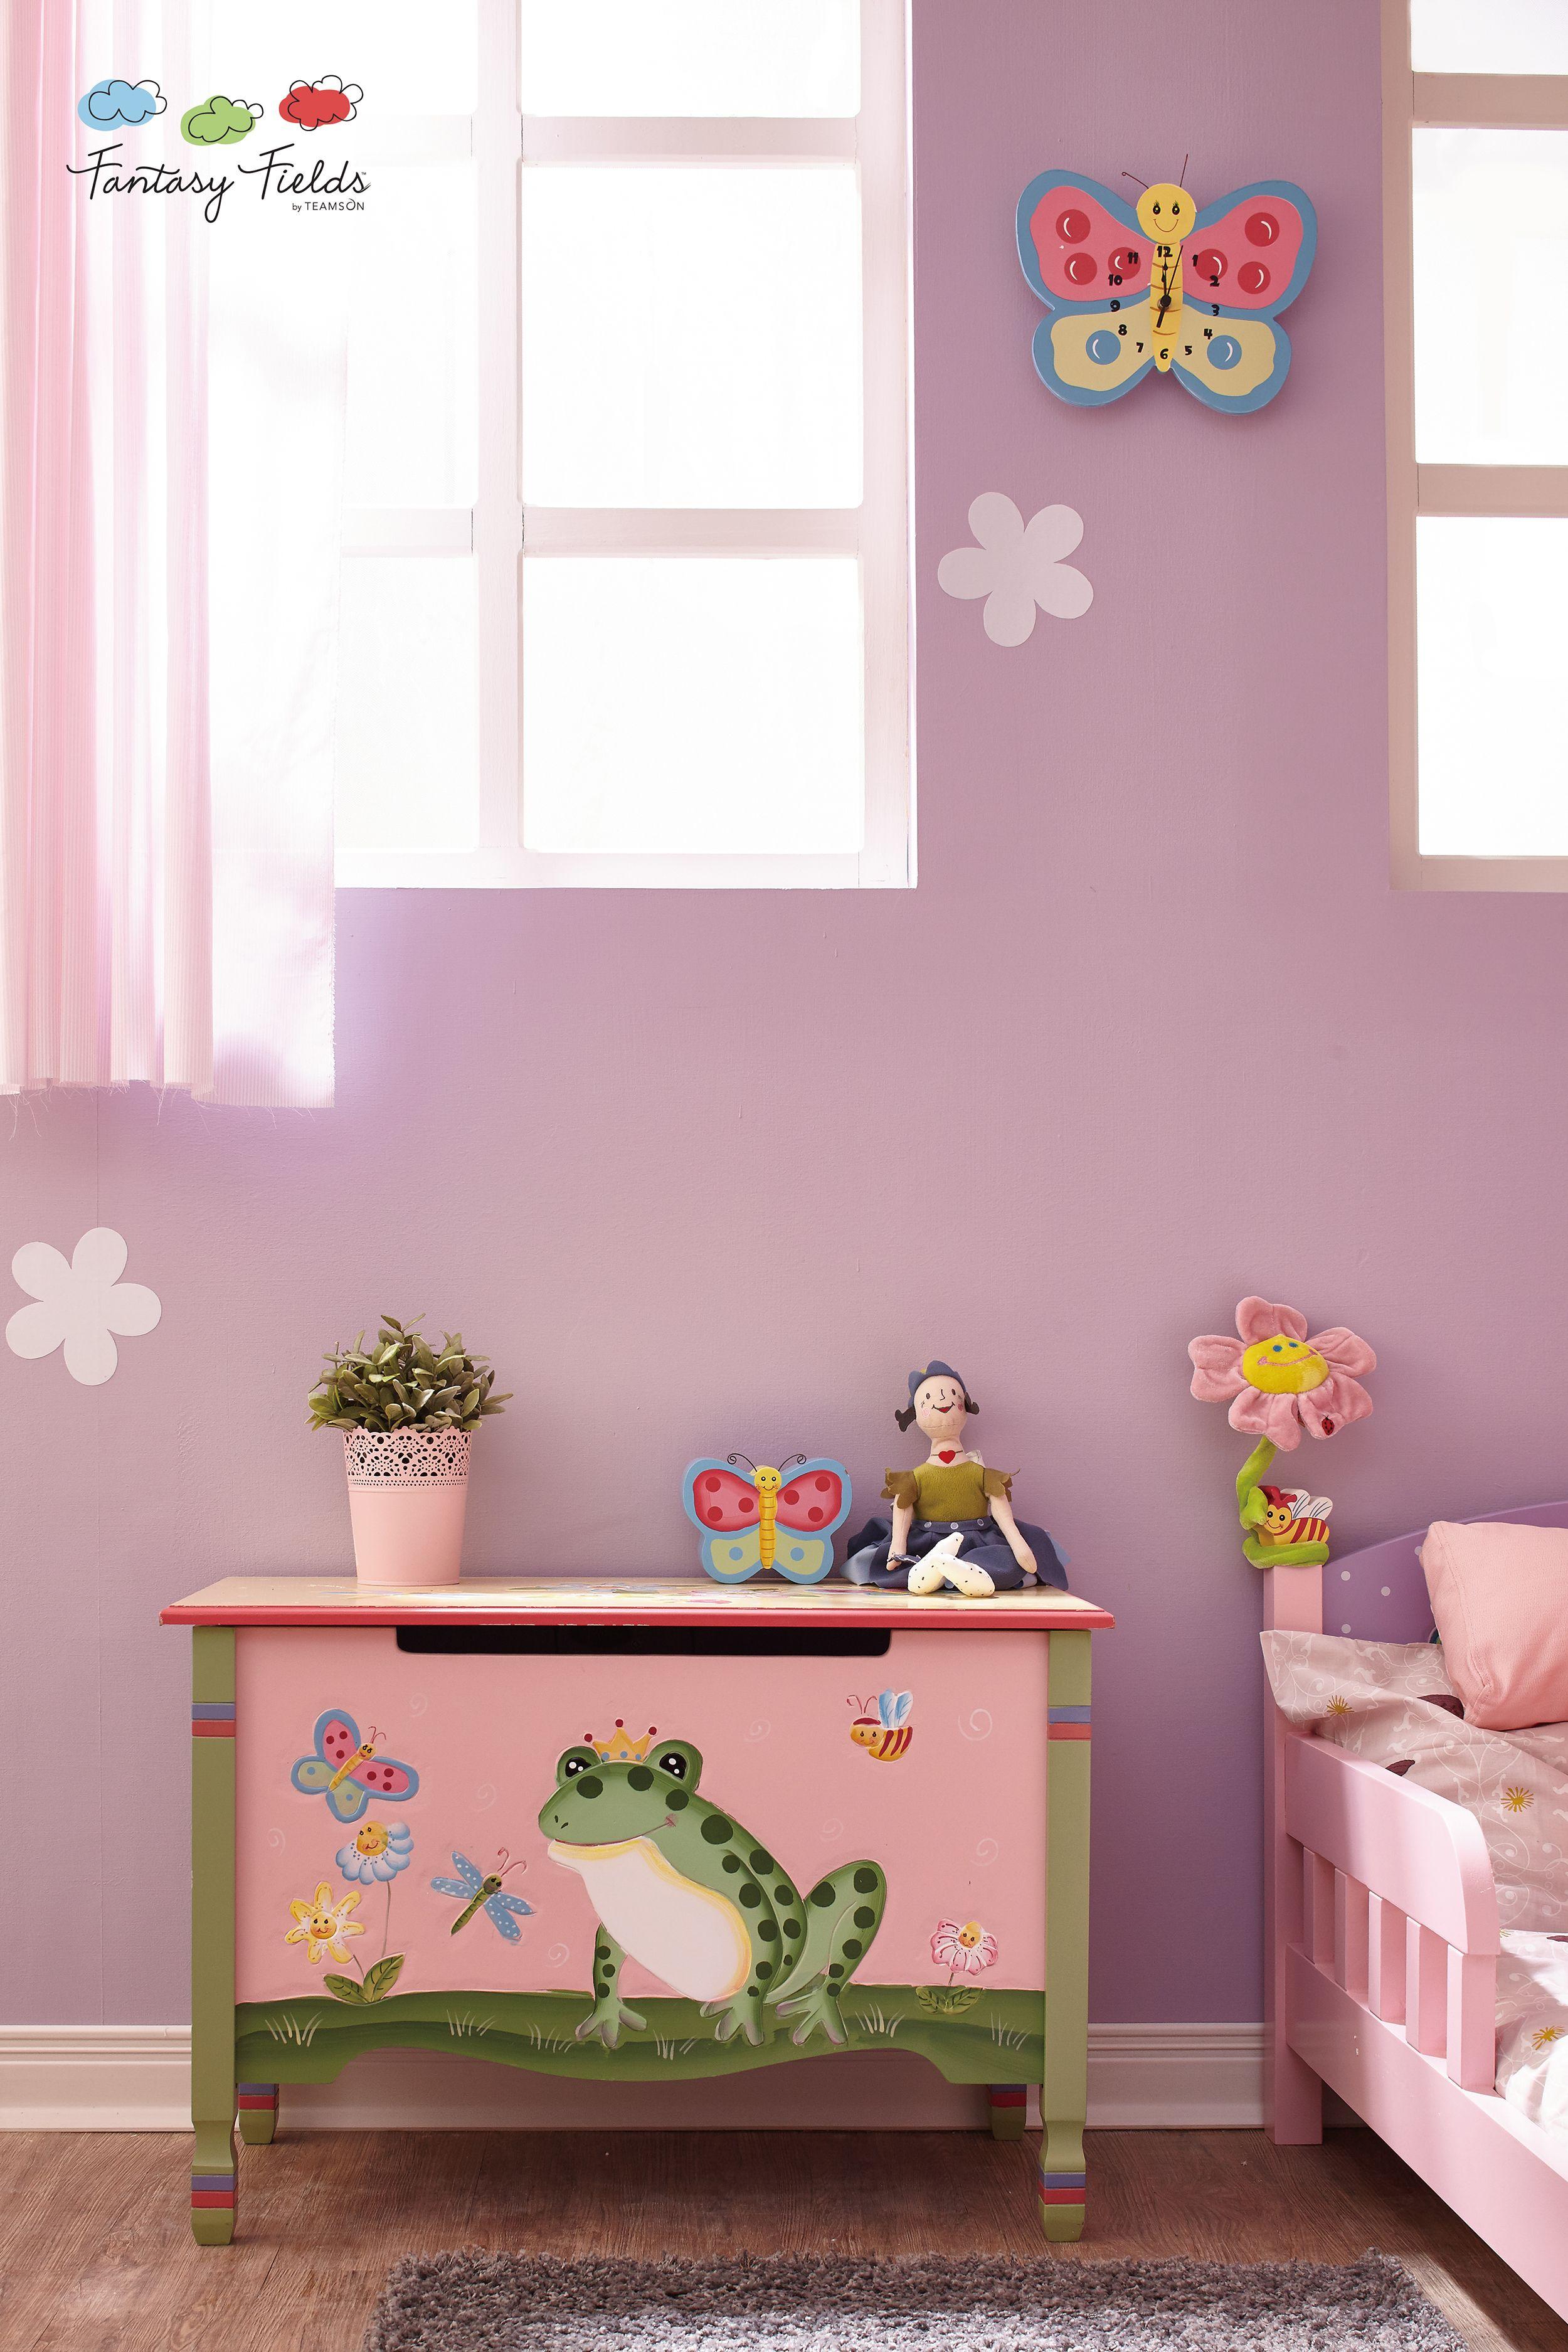 Fantasy Fields Magic Garden Toy Box With Rocking Chair Kid Room Decor Kids Room Kids Room